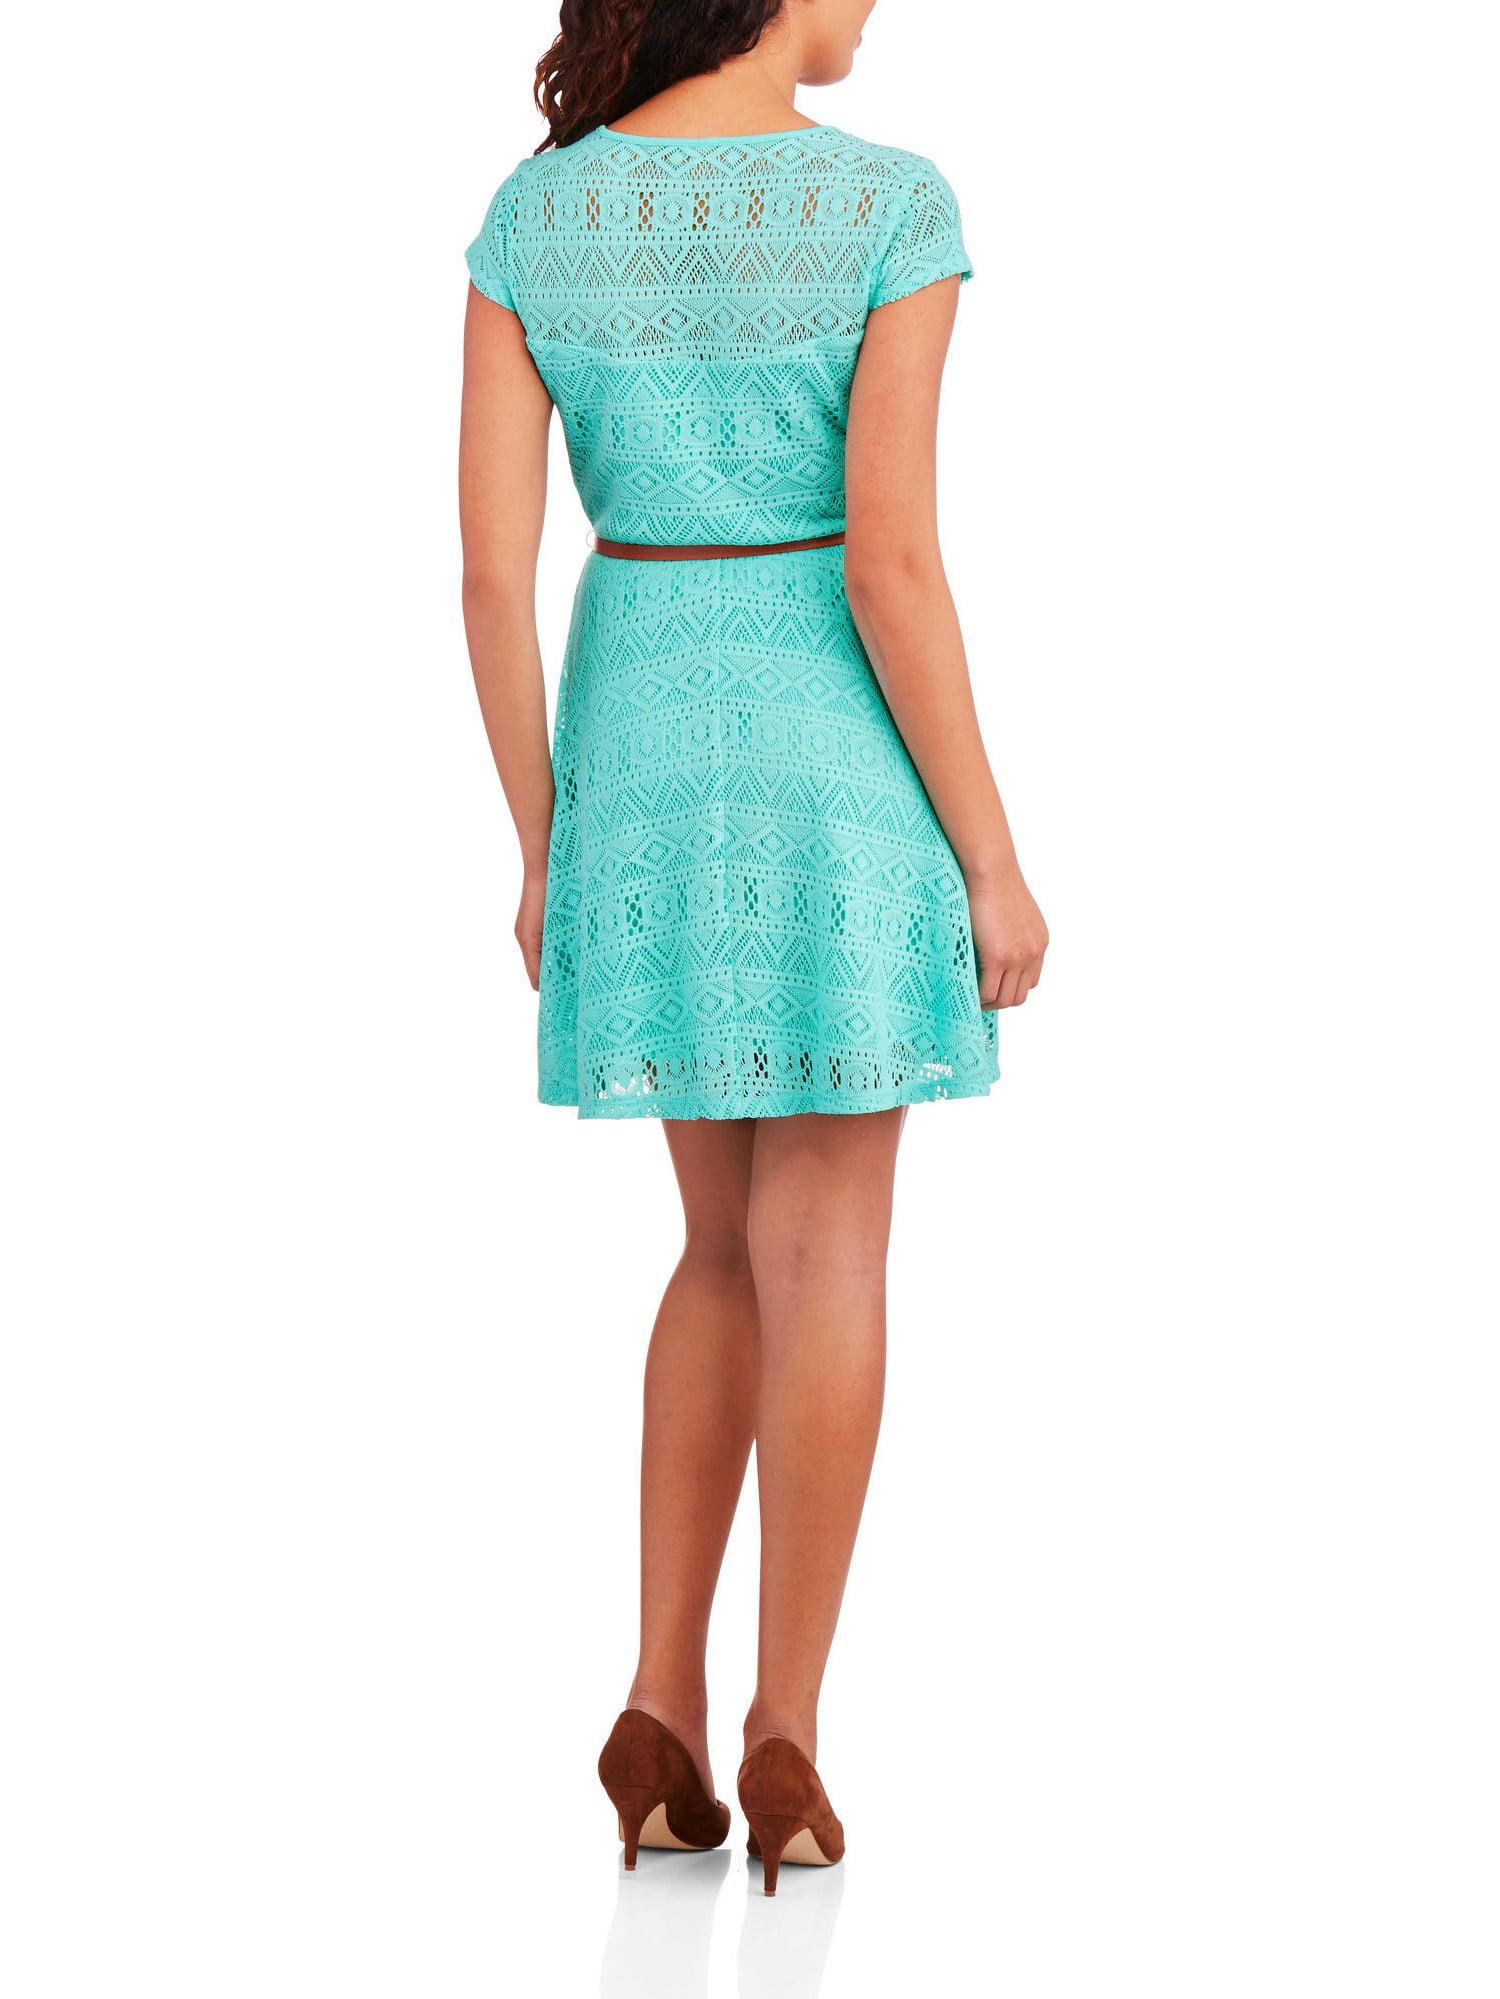 Juniors\' Sweetheart Neck Lace Skater Dress with Belt - Walmart.com